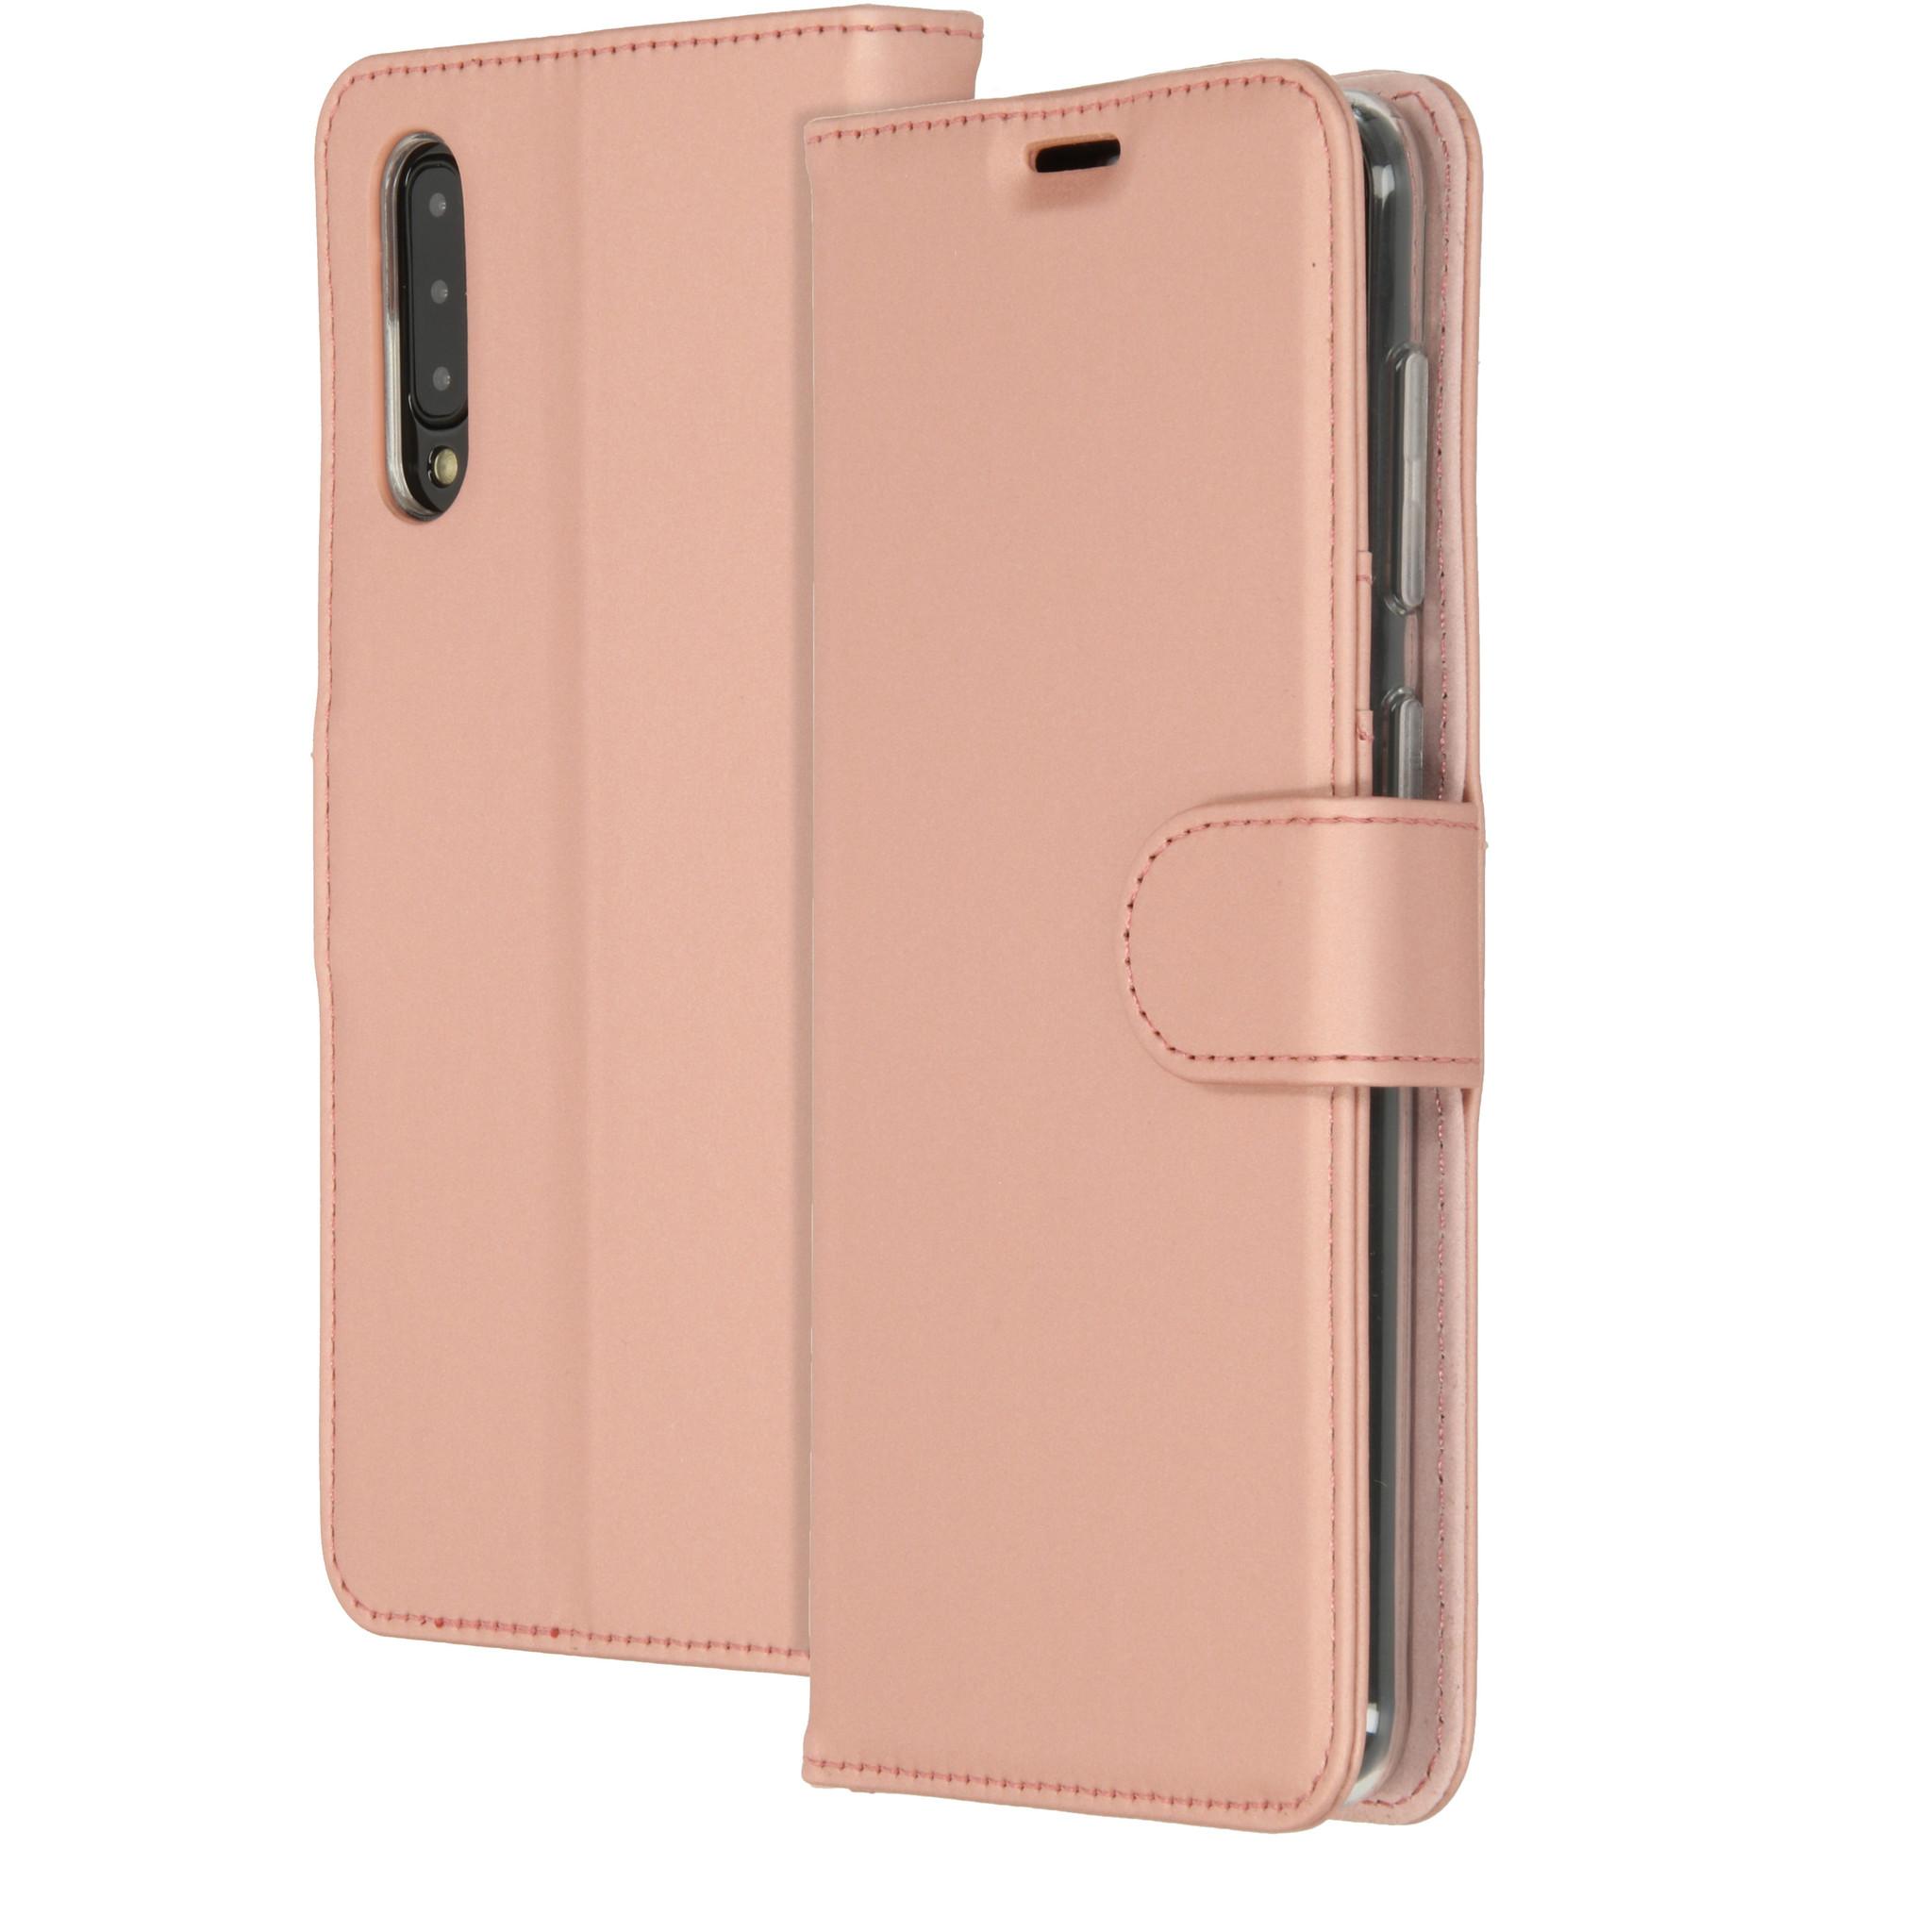 Accezz Wallet TPU Booklet Roségold für das Samsung Galaxy A50 / A30s